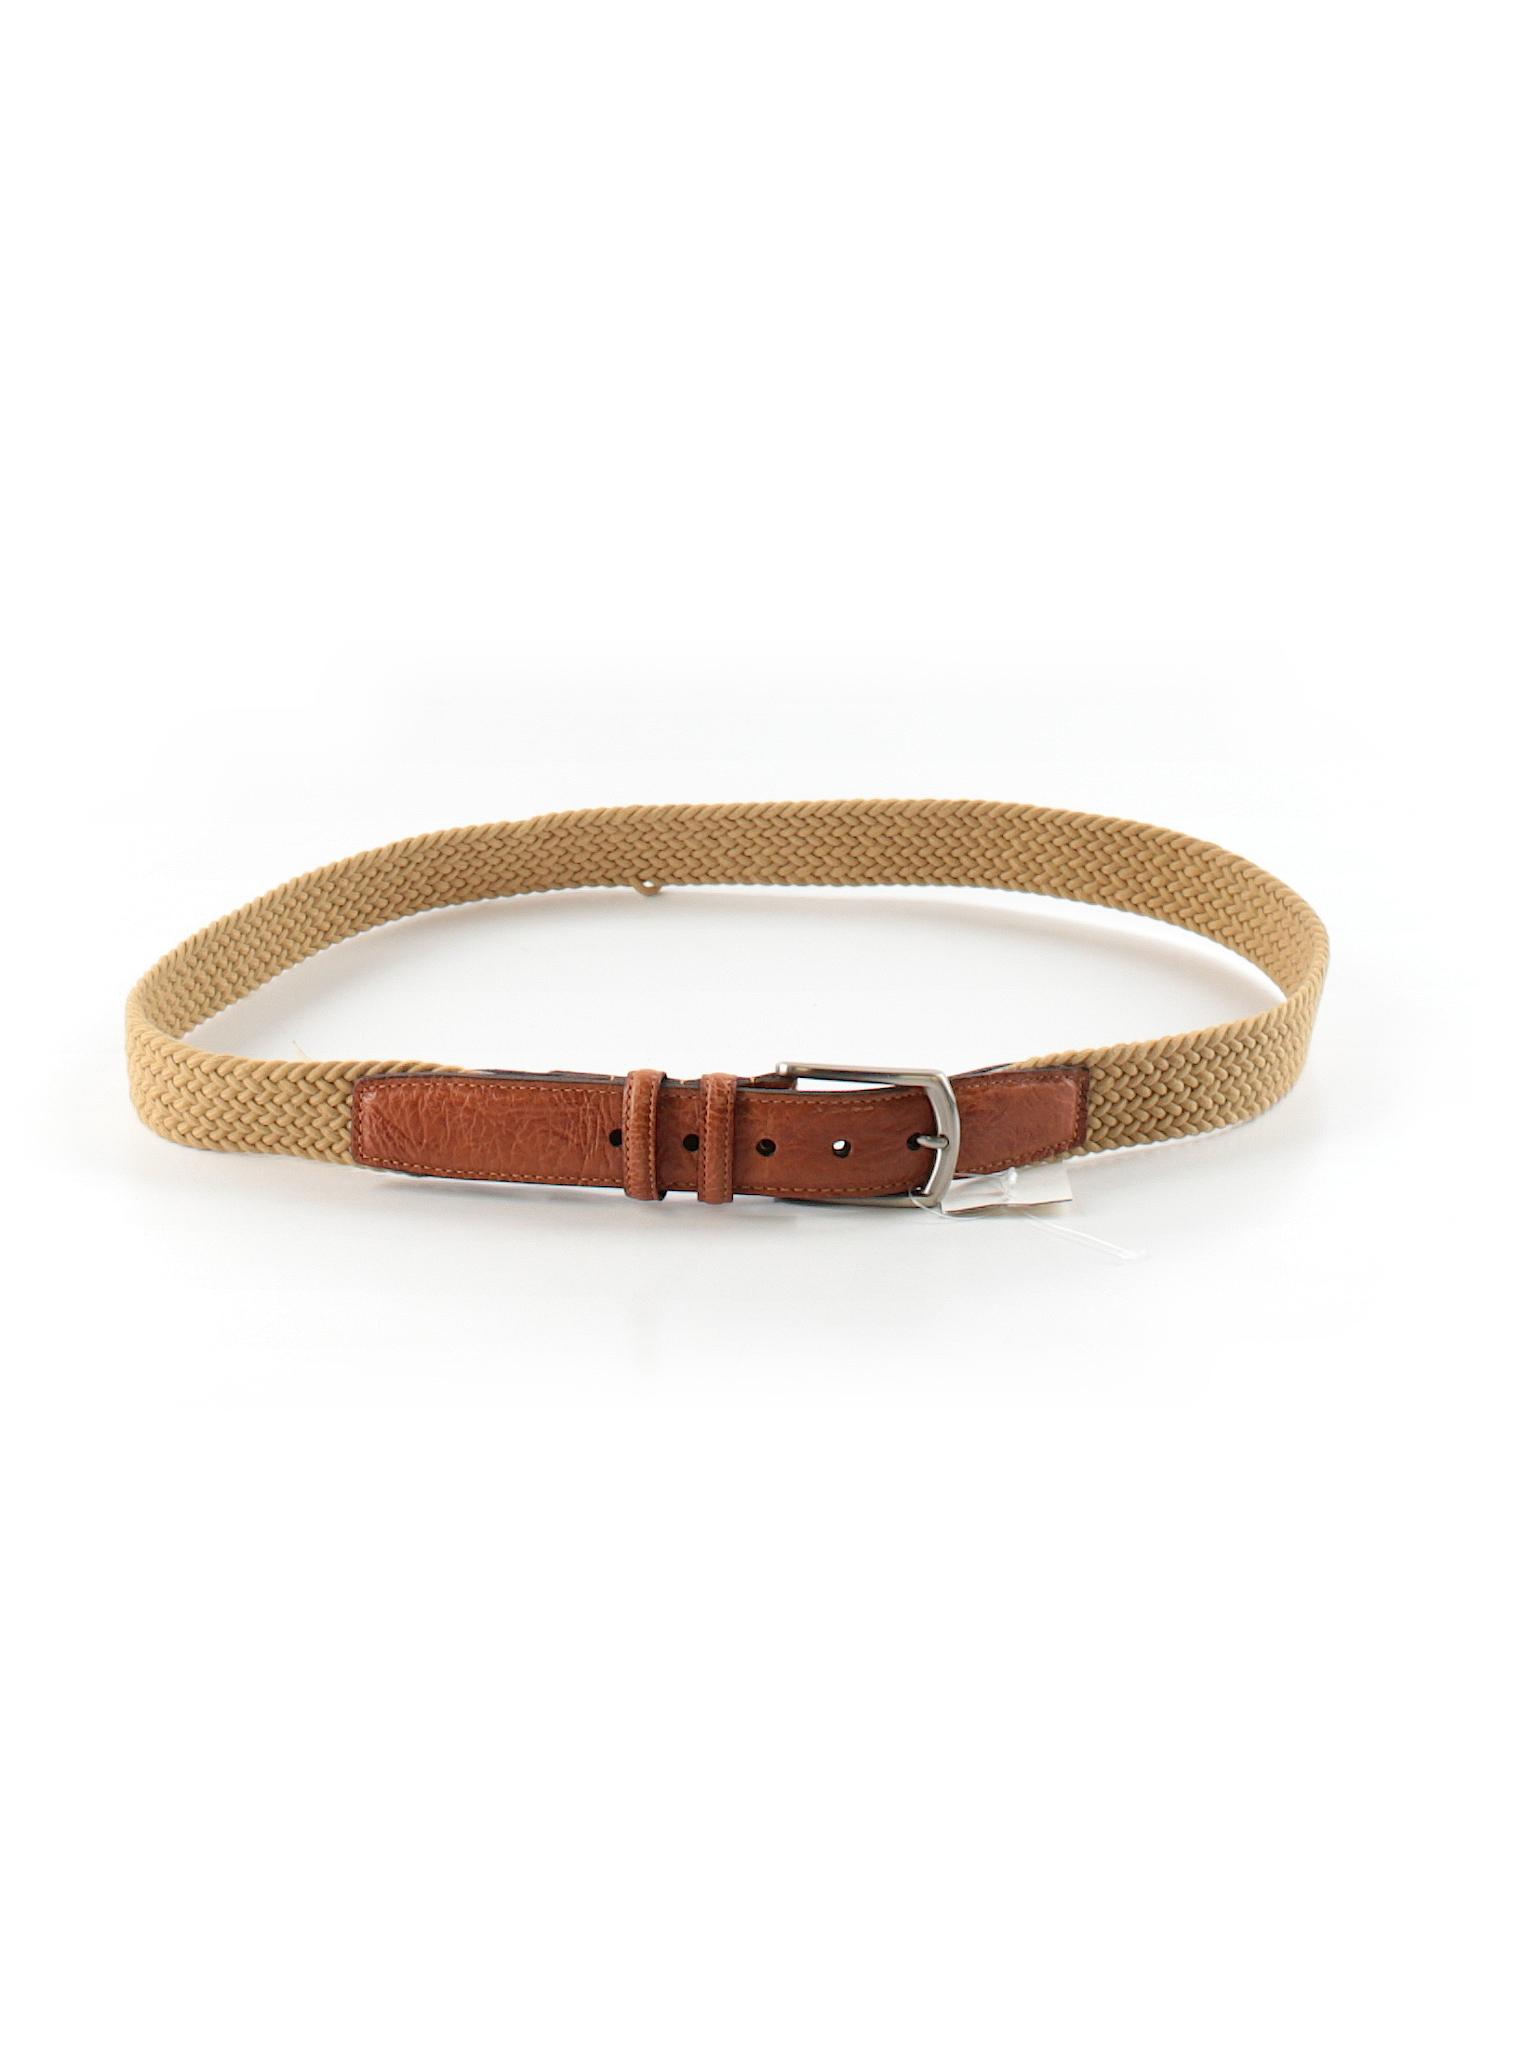 torino leather belt 66 only on thredup